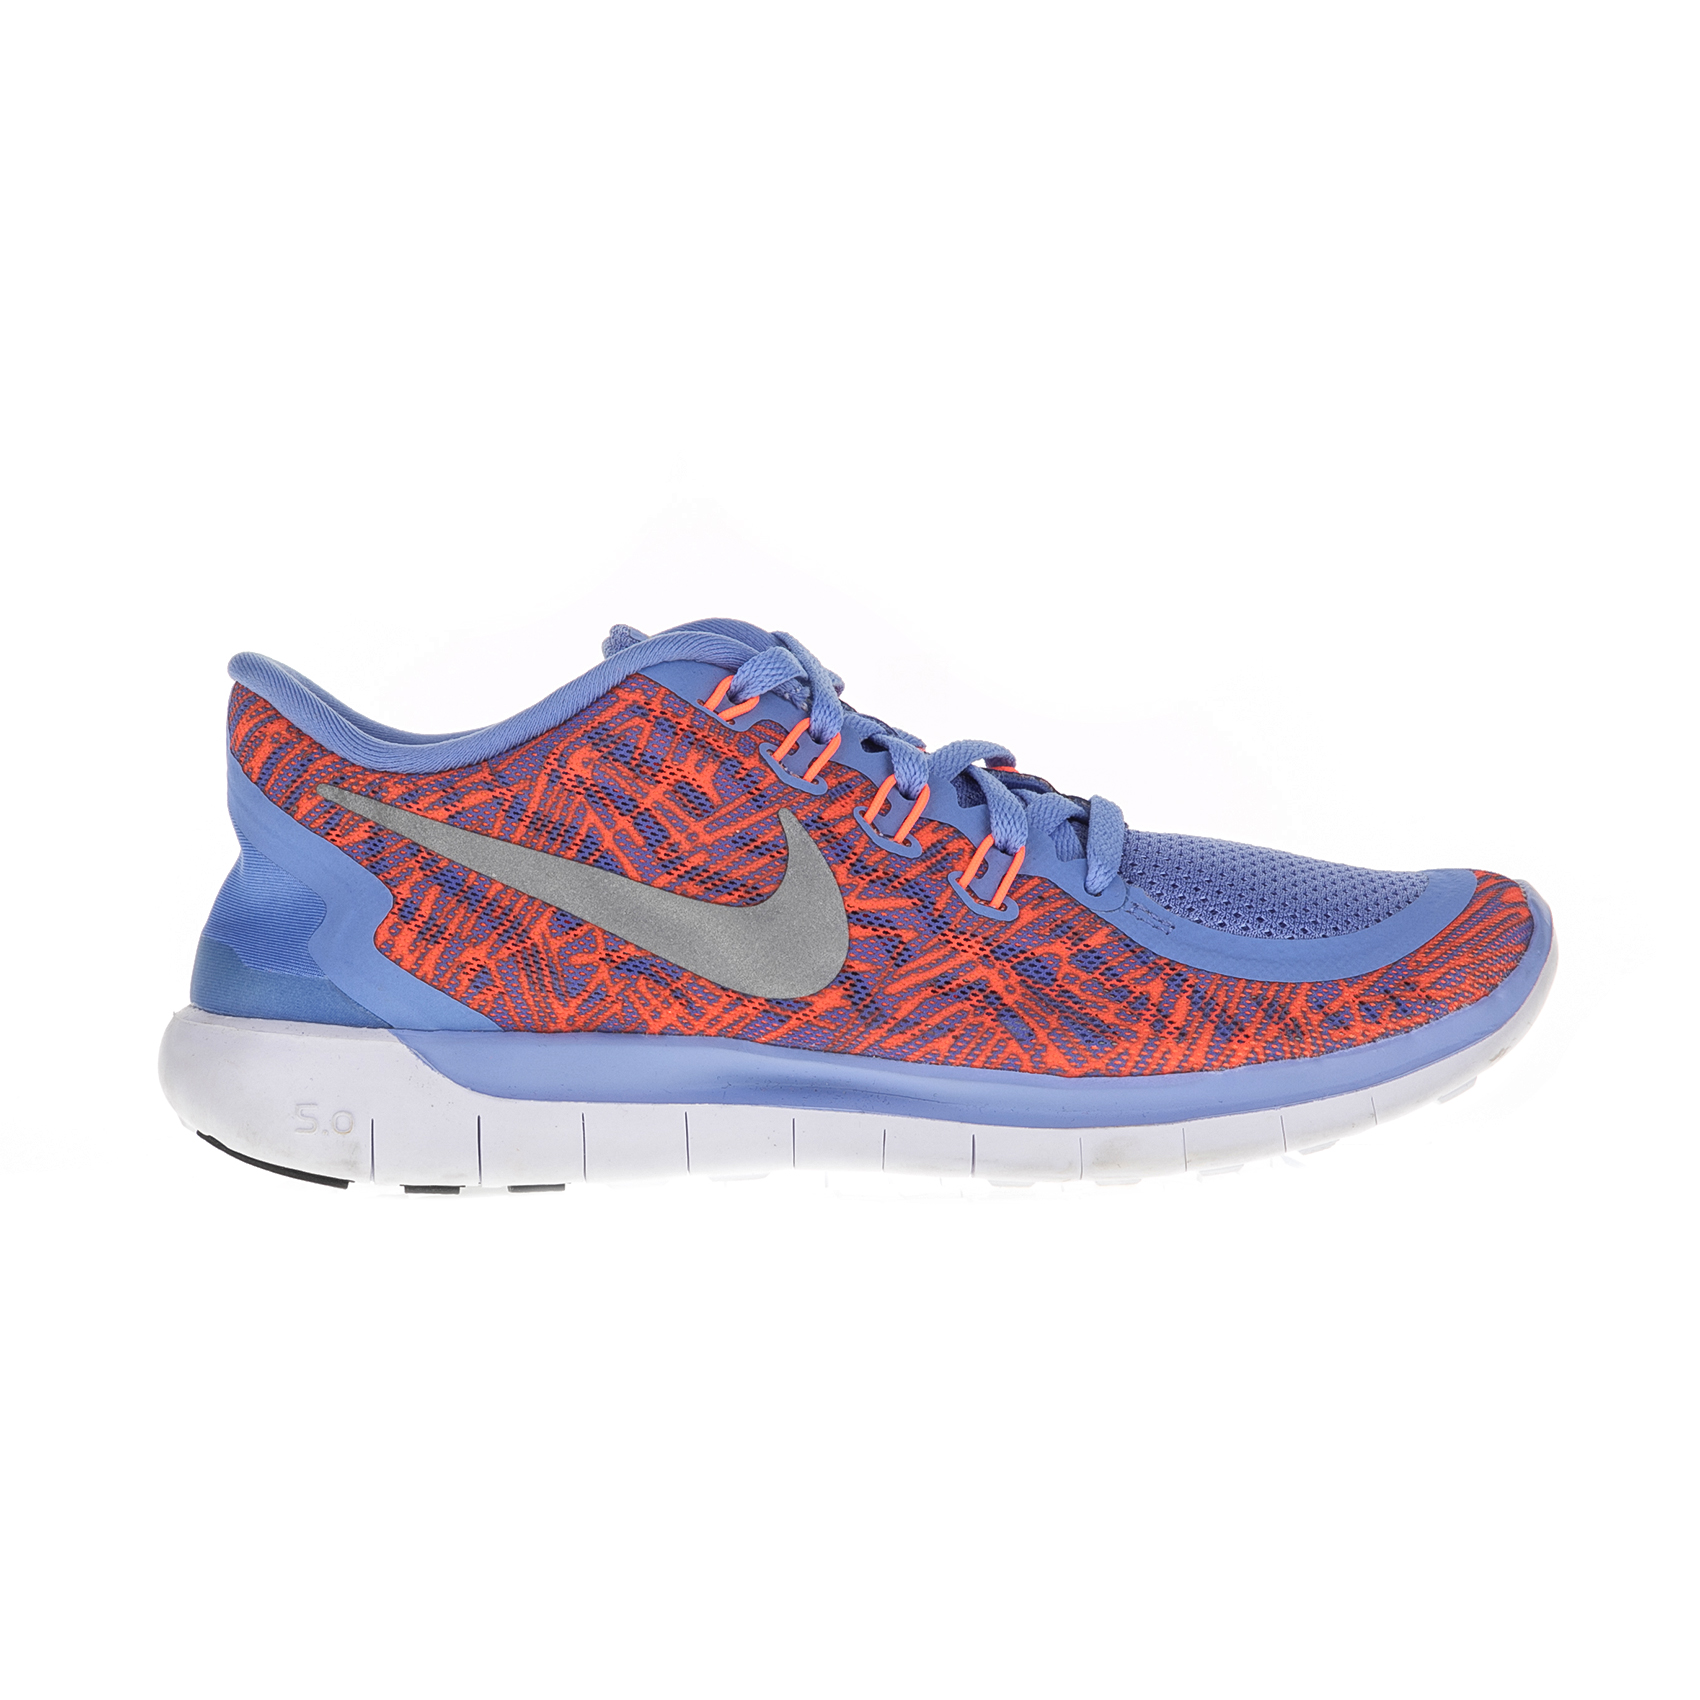 NIKE – Γυναικεία αθλητικά παπούτσια Nike FREE 5.0 PRINT μοβ